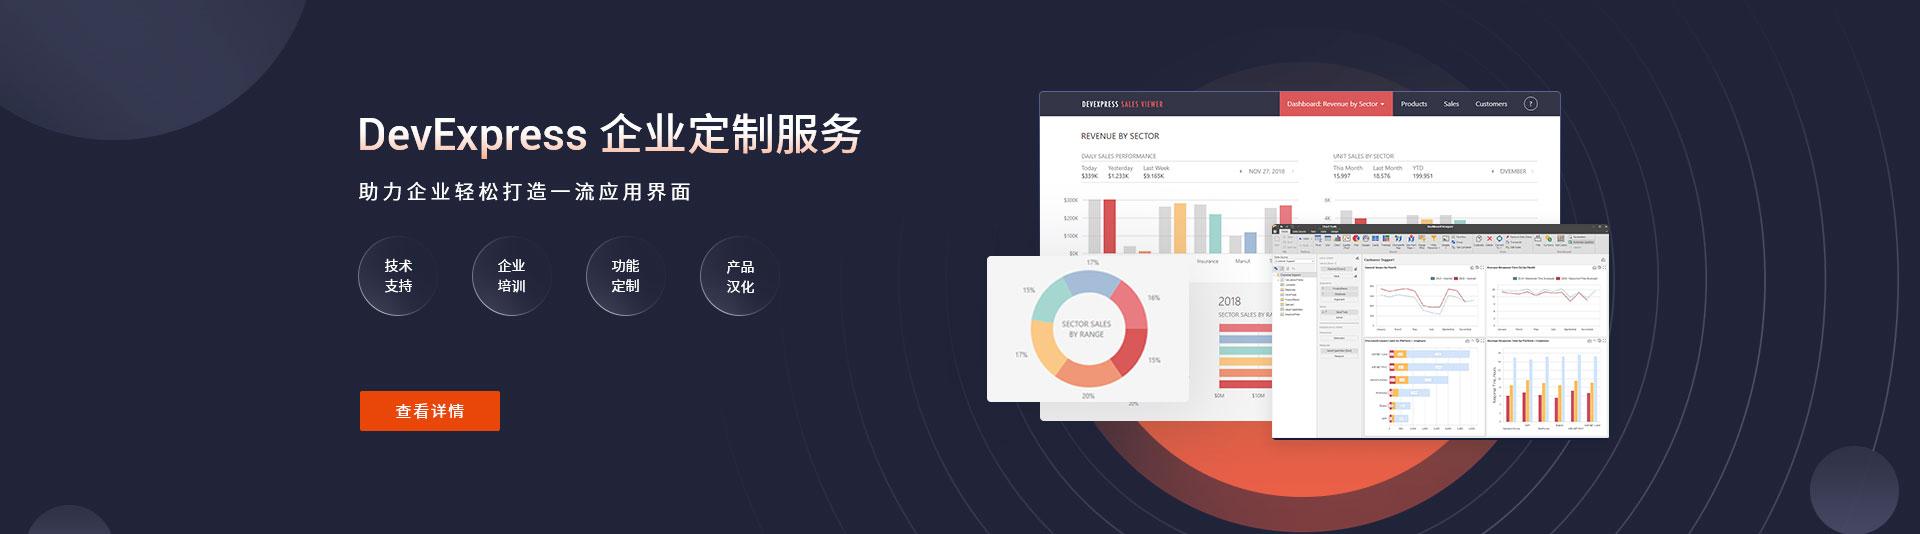 DevExpress企业定制化服务全新升级,助力企业打造一流应用界面